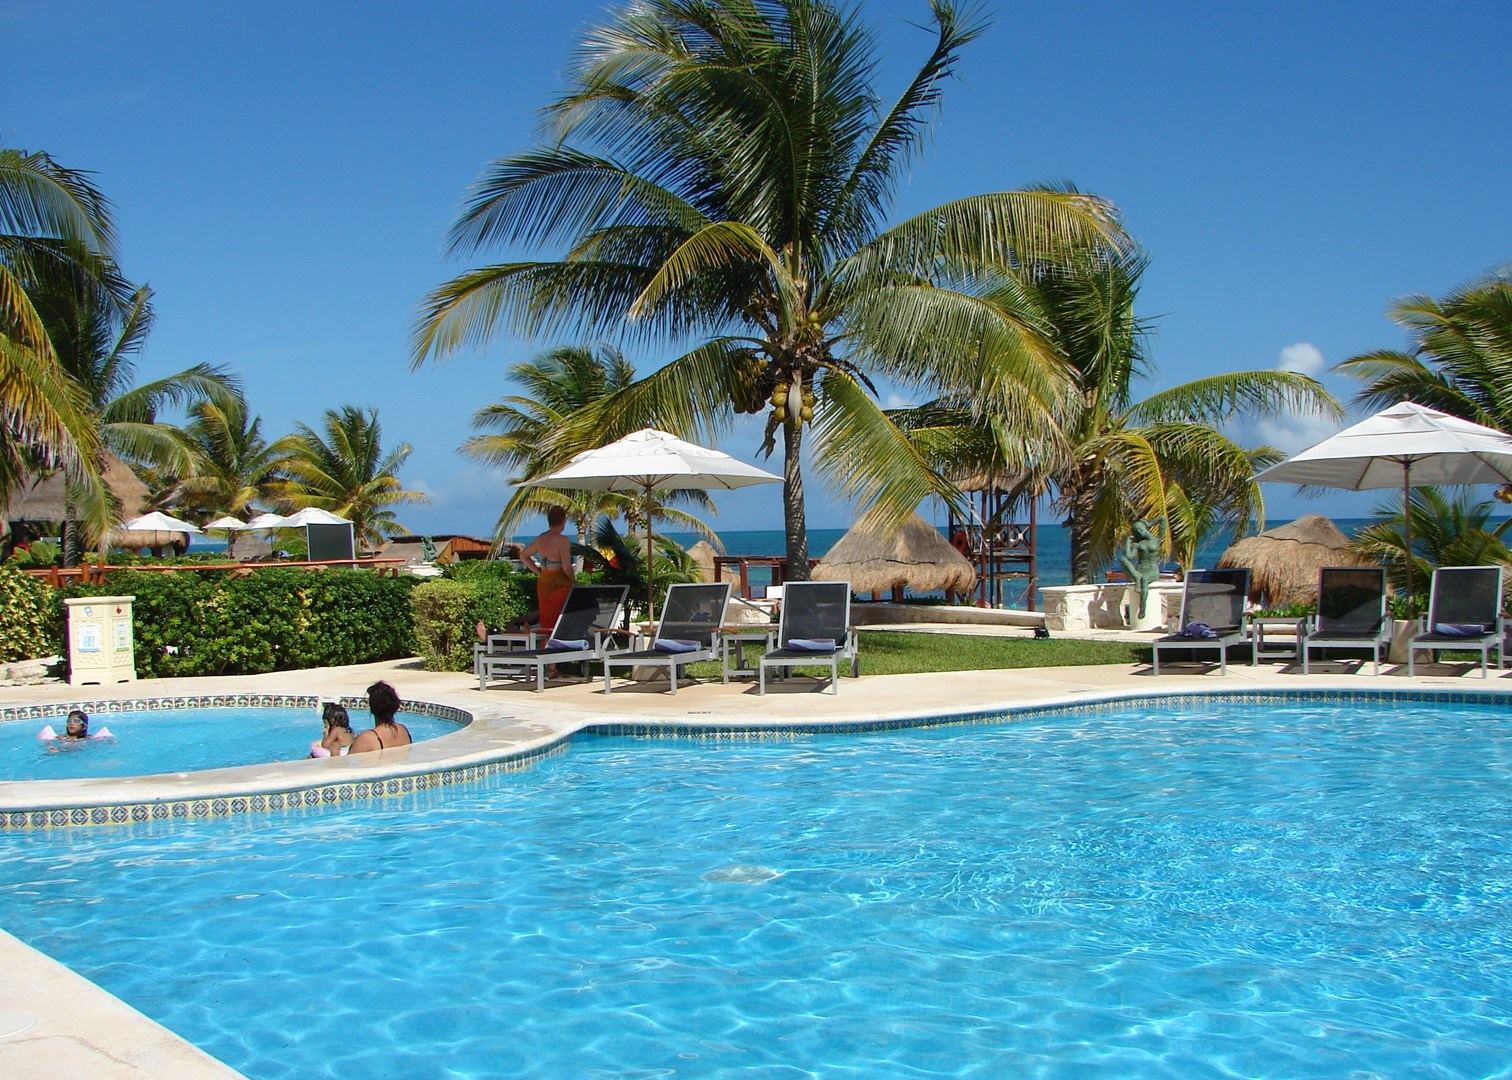 Azul Beach Hotel | The Mayan Riviera | Audley Travel